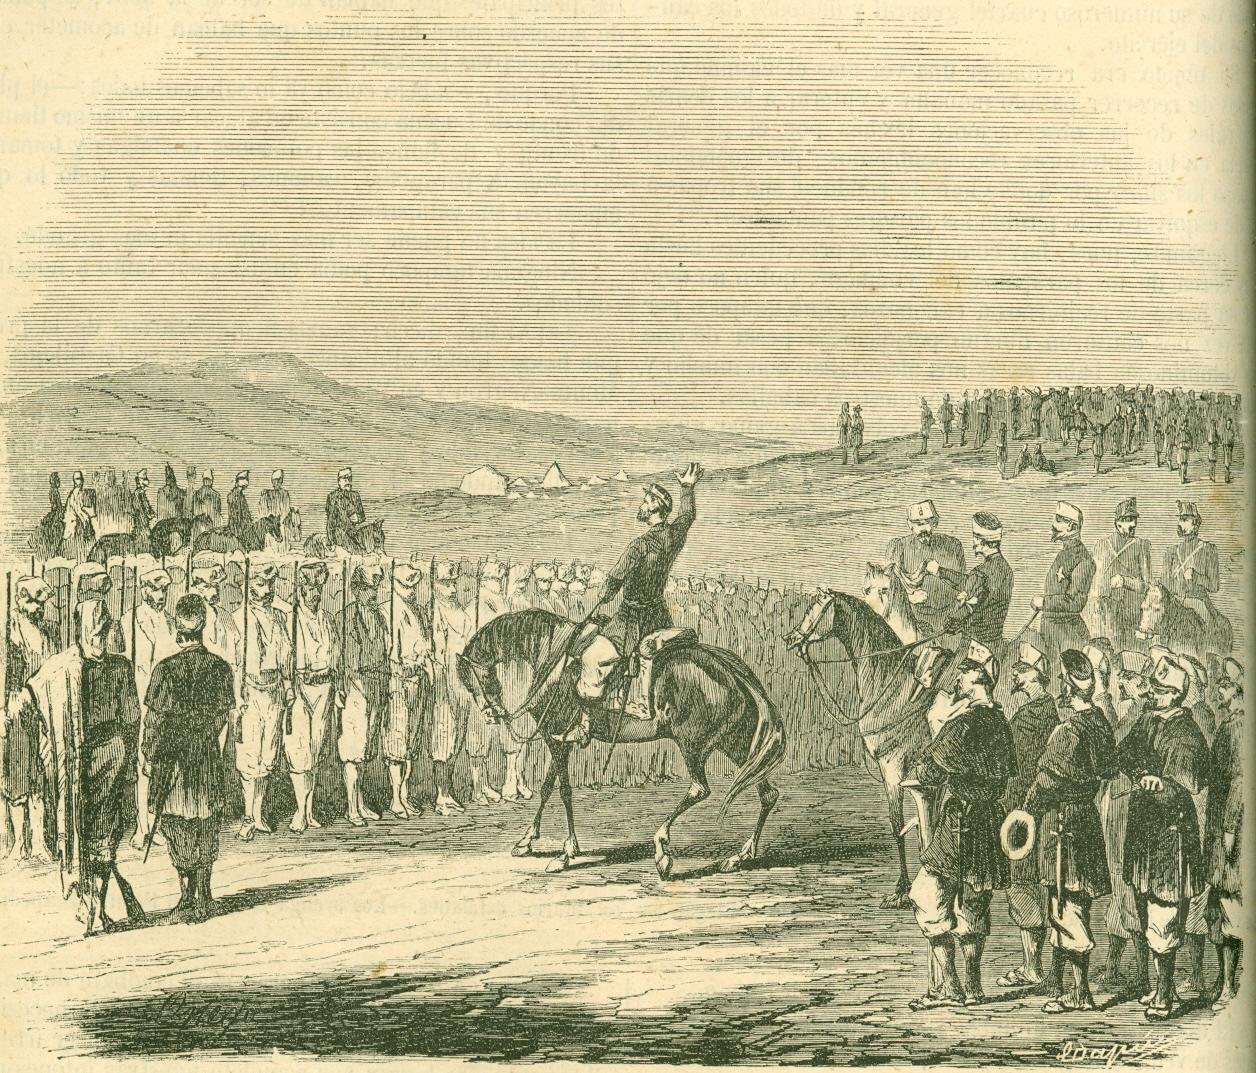 La guerra de África (1859-1860) — Museo Zumalakarregi